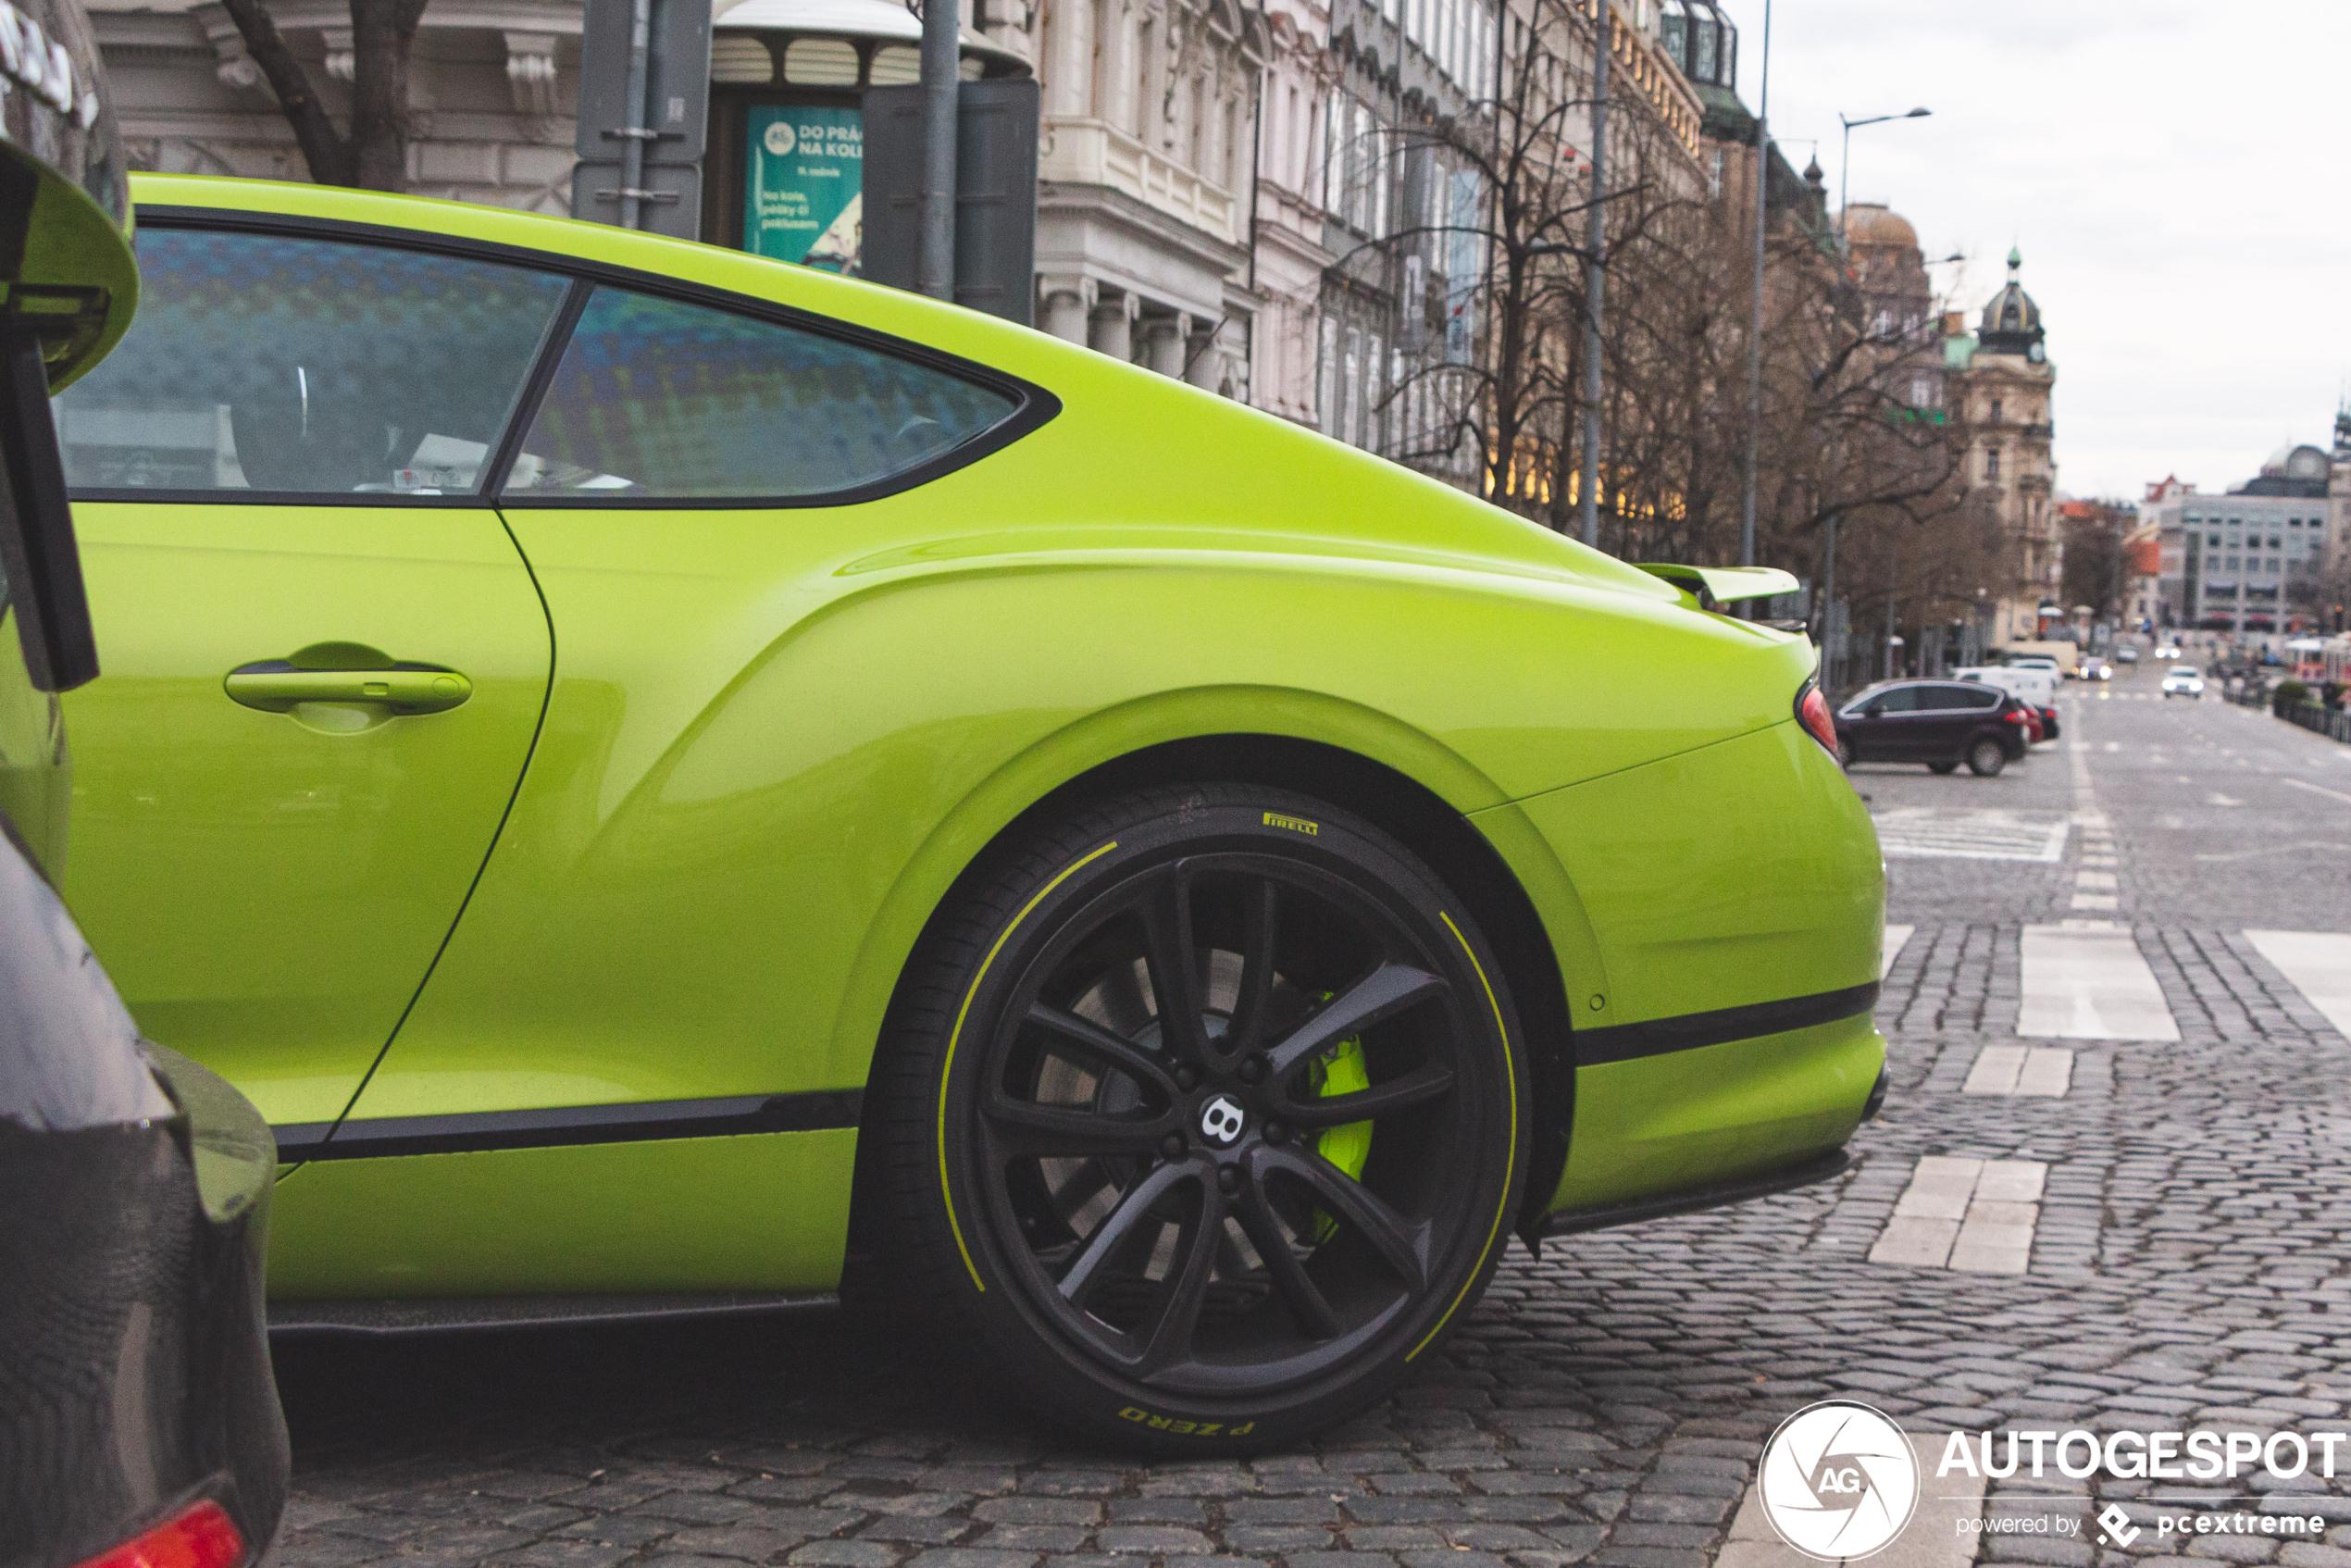 Primeur gespot: Bentley Pikes Peak Continental GT